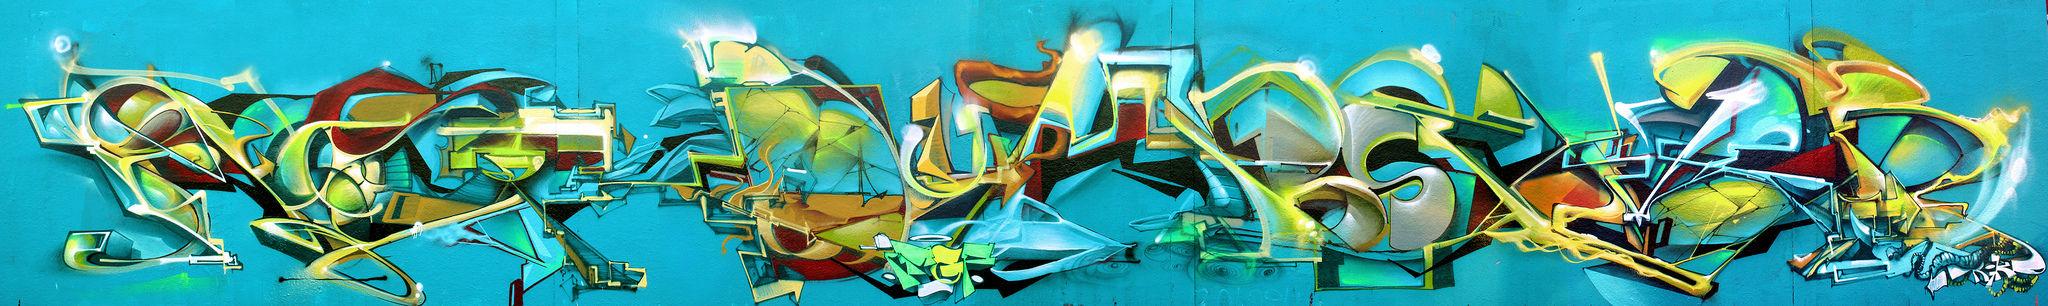 Artwork By Redone in Paris